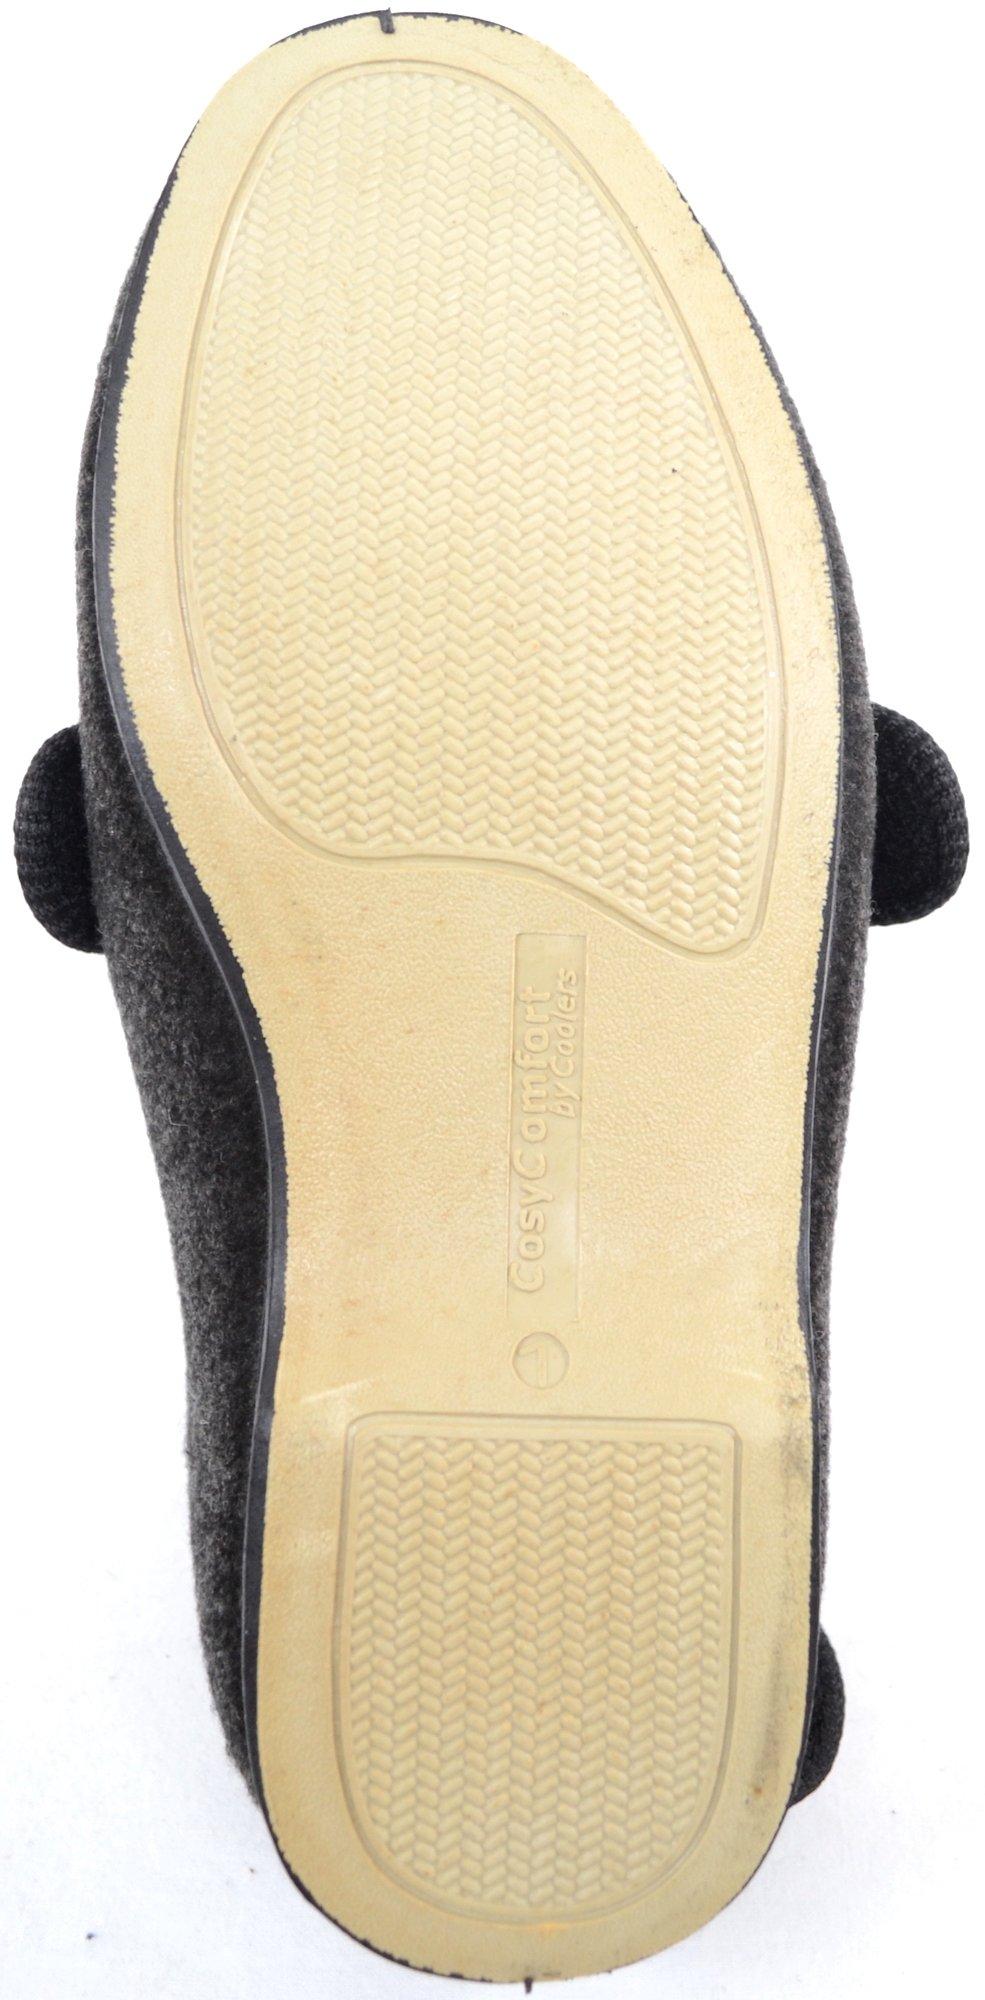 ABSOLUTE FOOTWEAR Mens Orthopaedic/Extra Wide Fit Adjustable Slipper Boot/Slippers - Grey - 10 US by ABSOLUTE FOOTWEAR (Image #7)